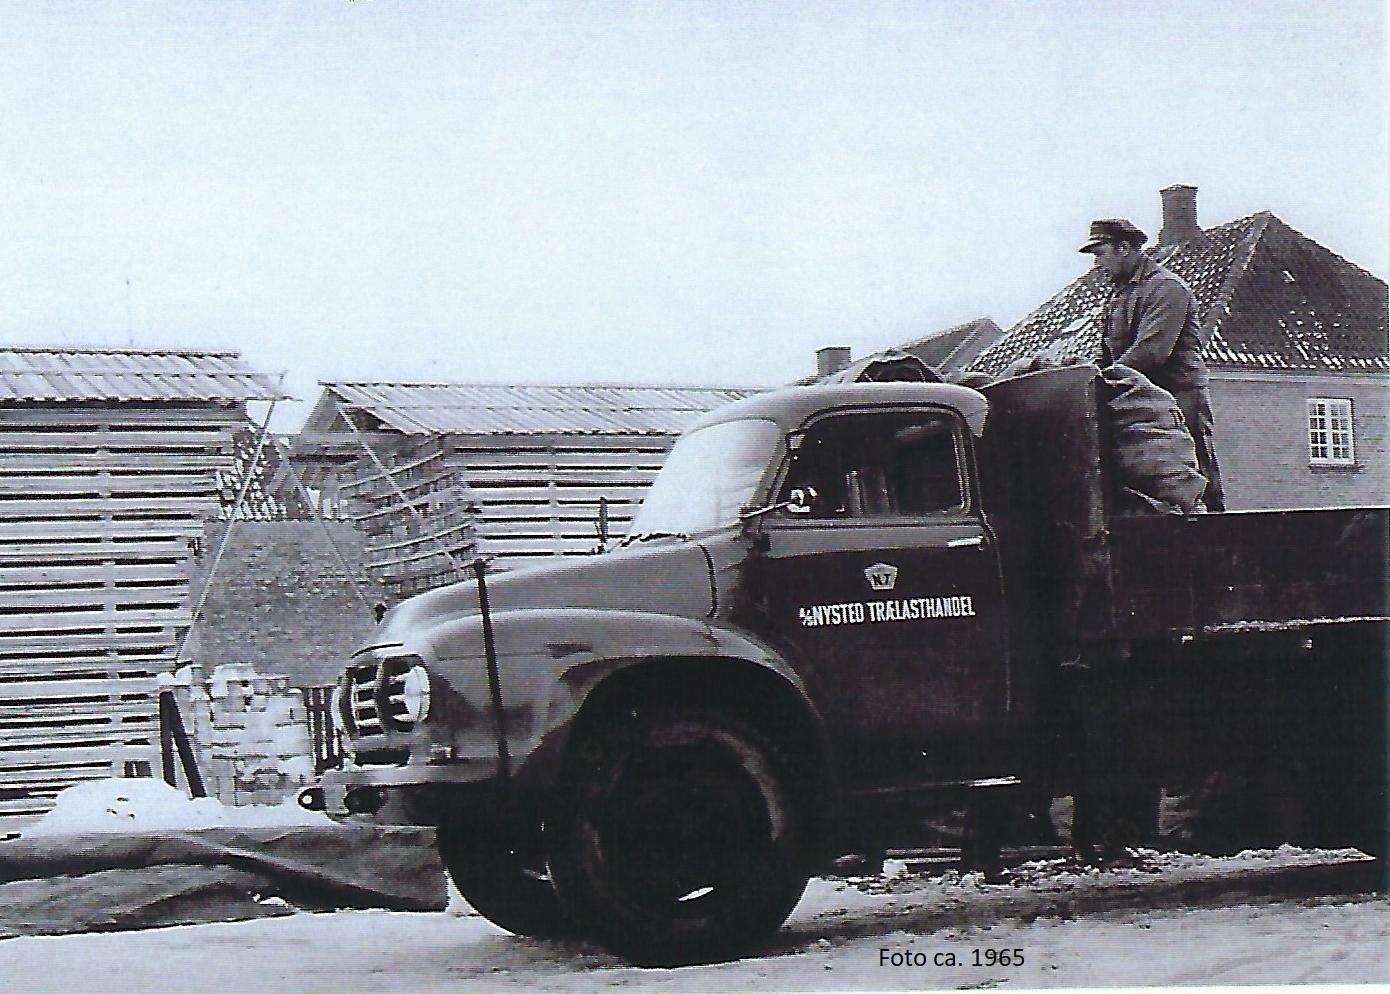 31-1965-ca.-31